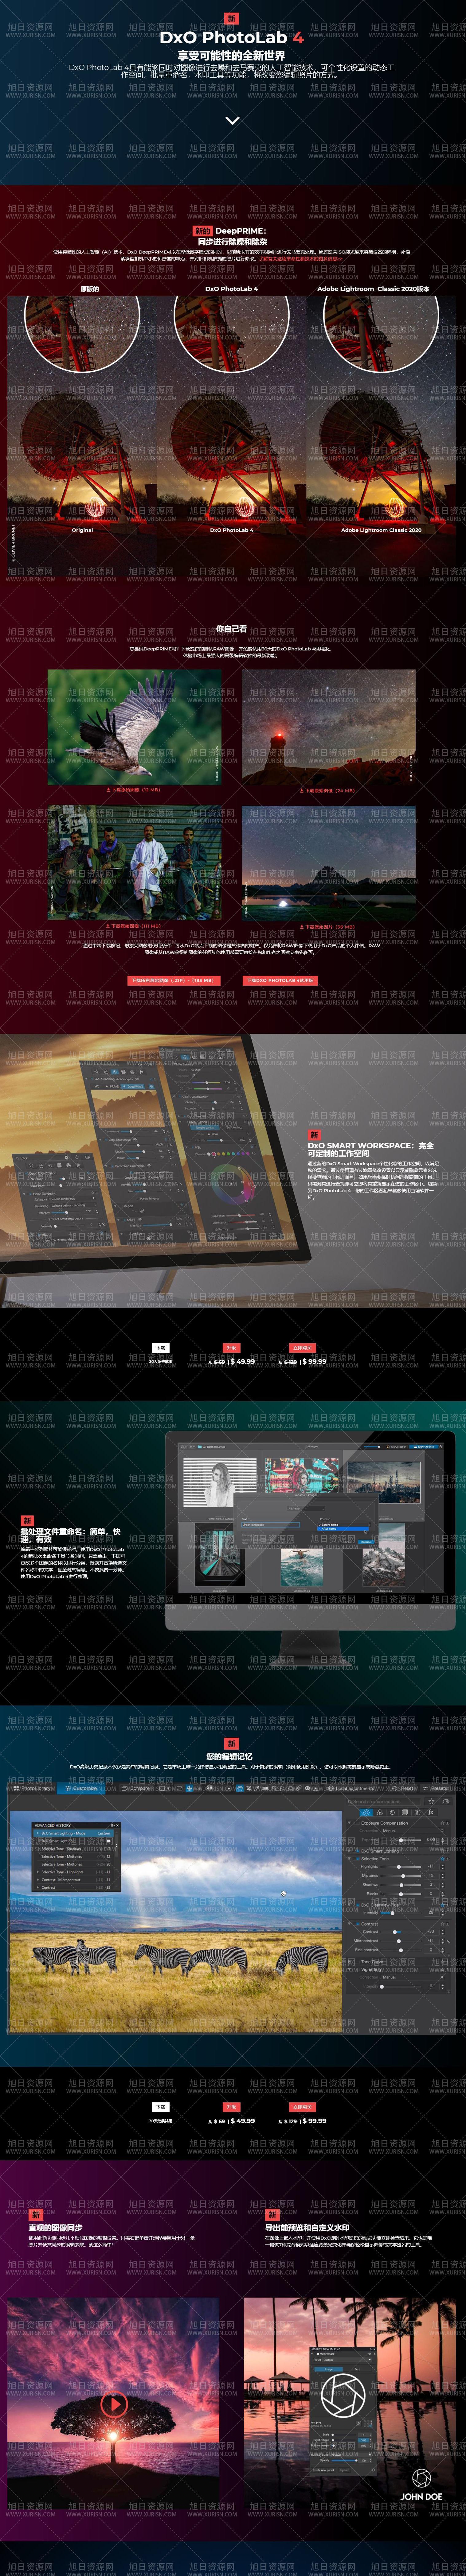 VIP资源-照片后期处理软件DxO PhotoLab 4.2.1 Build 4542 中文汉化版(5)